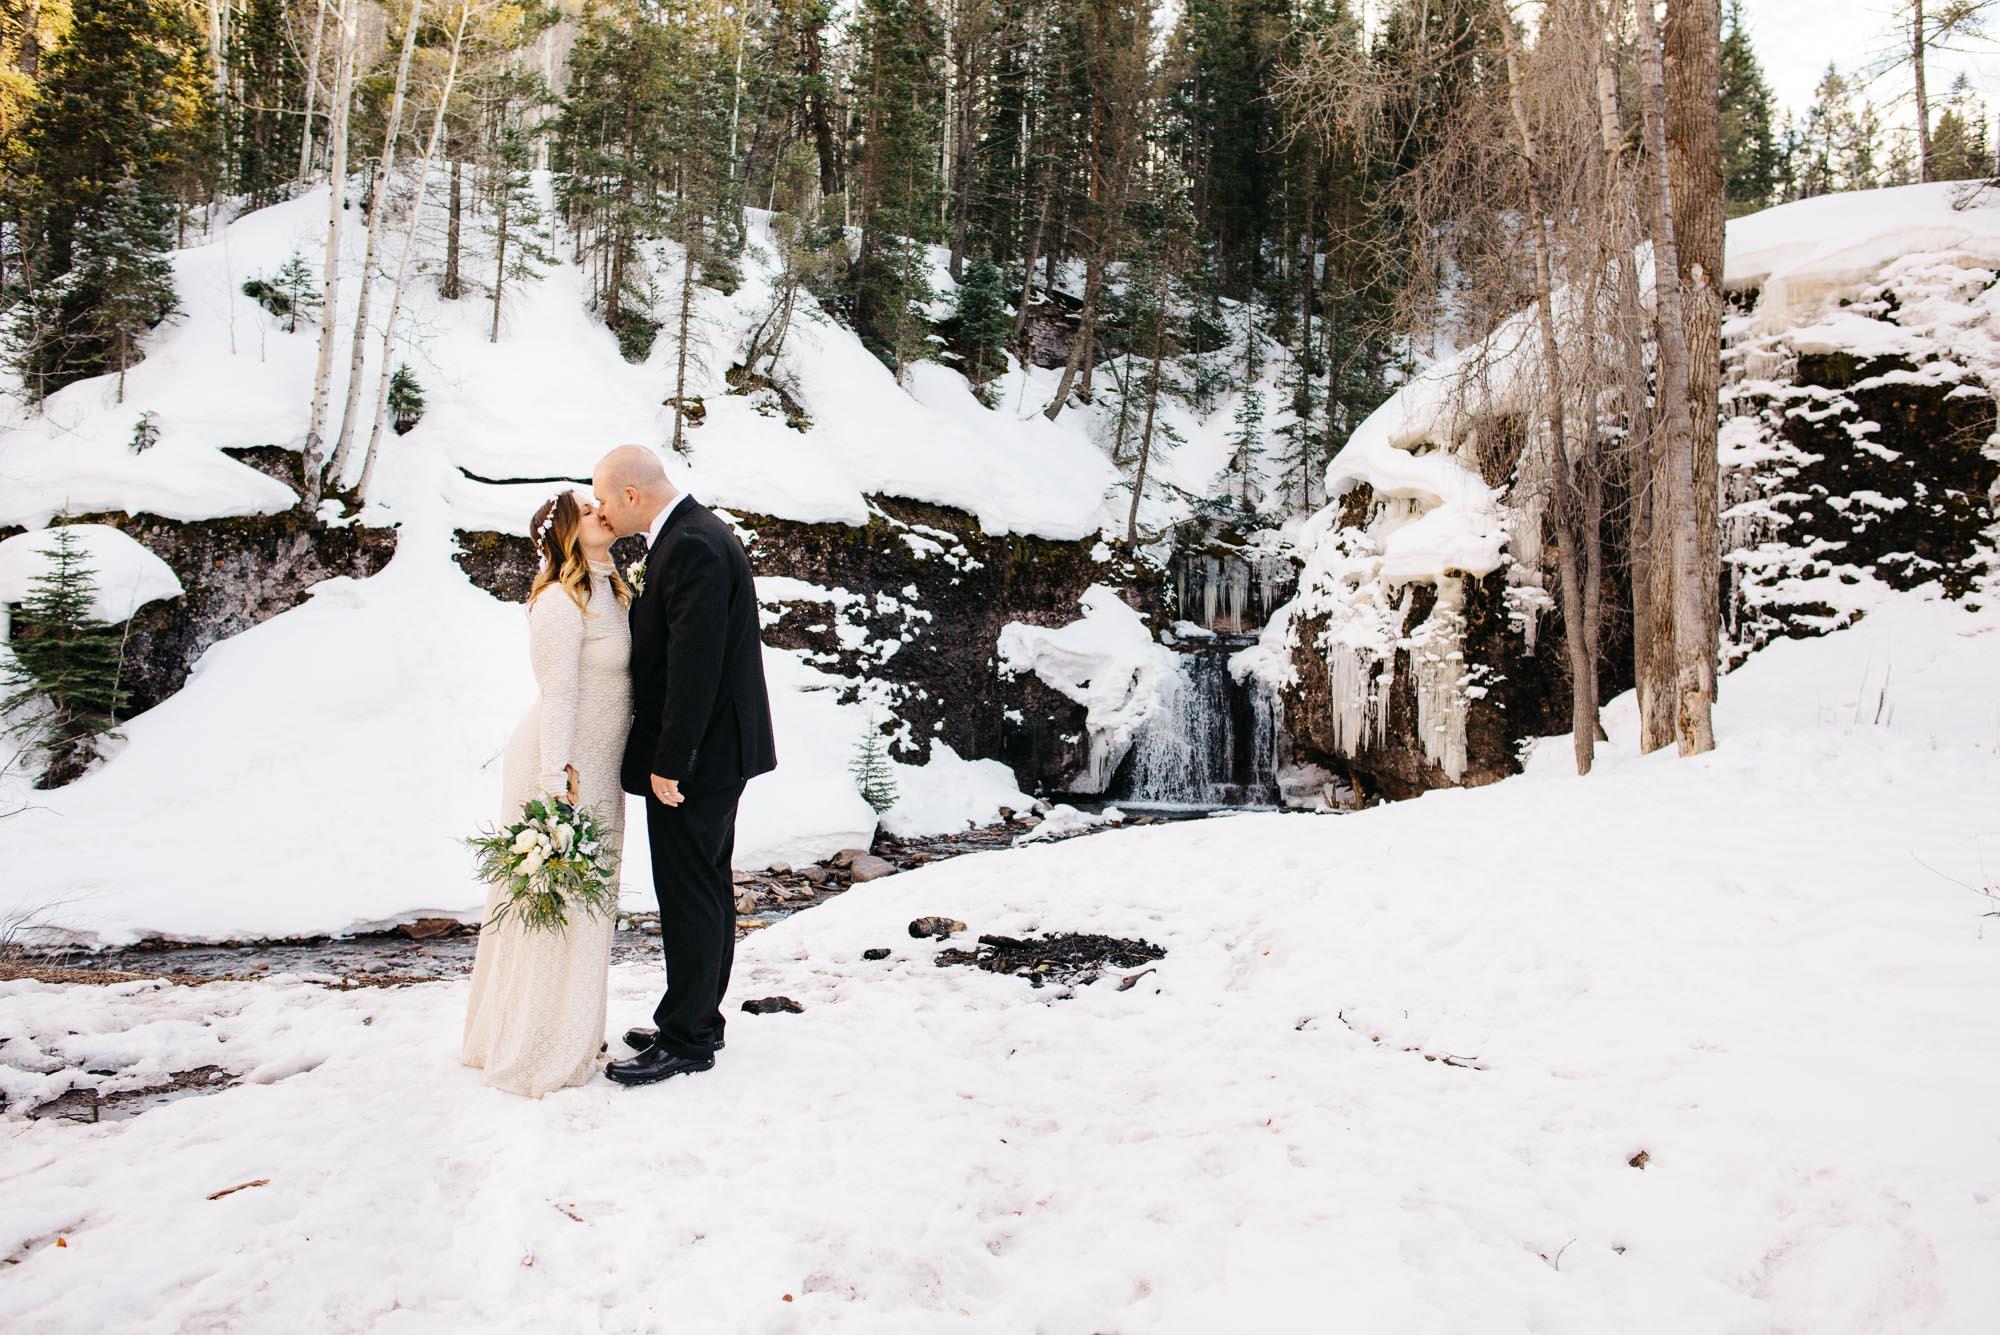 116elopement-photographer-colorado-telluride-winter-wedding-mountain-wedding-photographer-paige&chad-0827-2.jpg